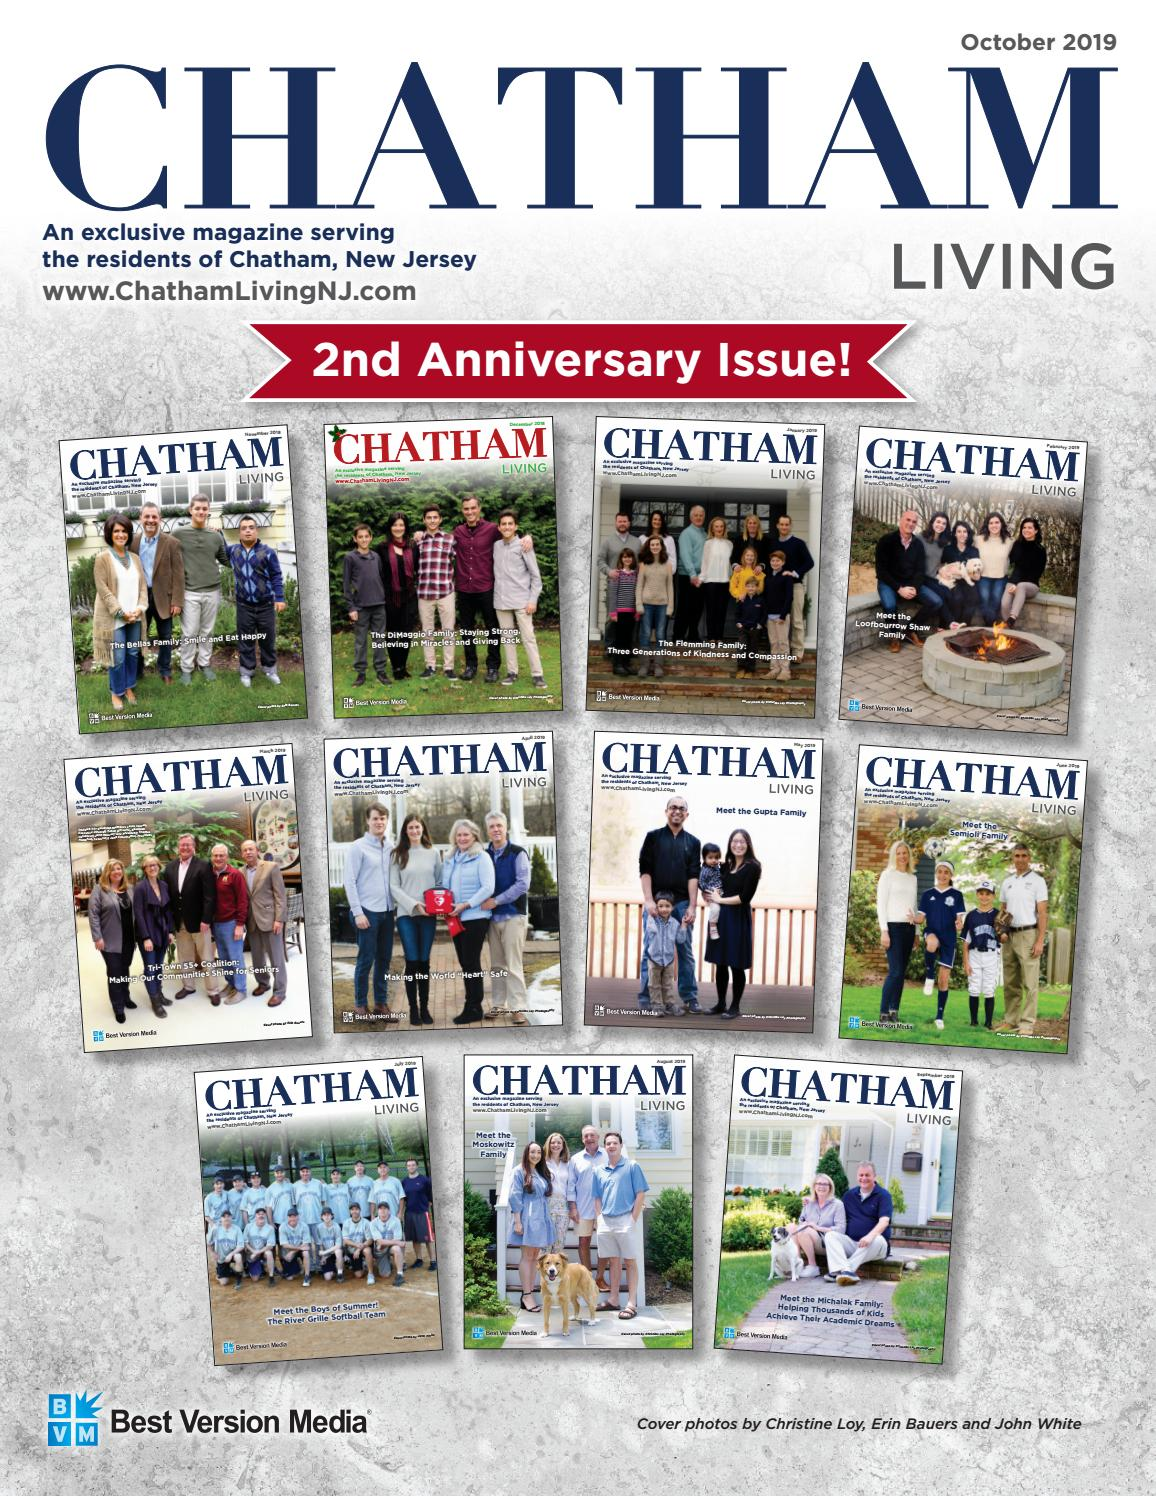 chatham living magazine, chatham, new jersey - october, 2019